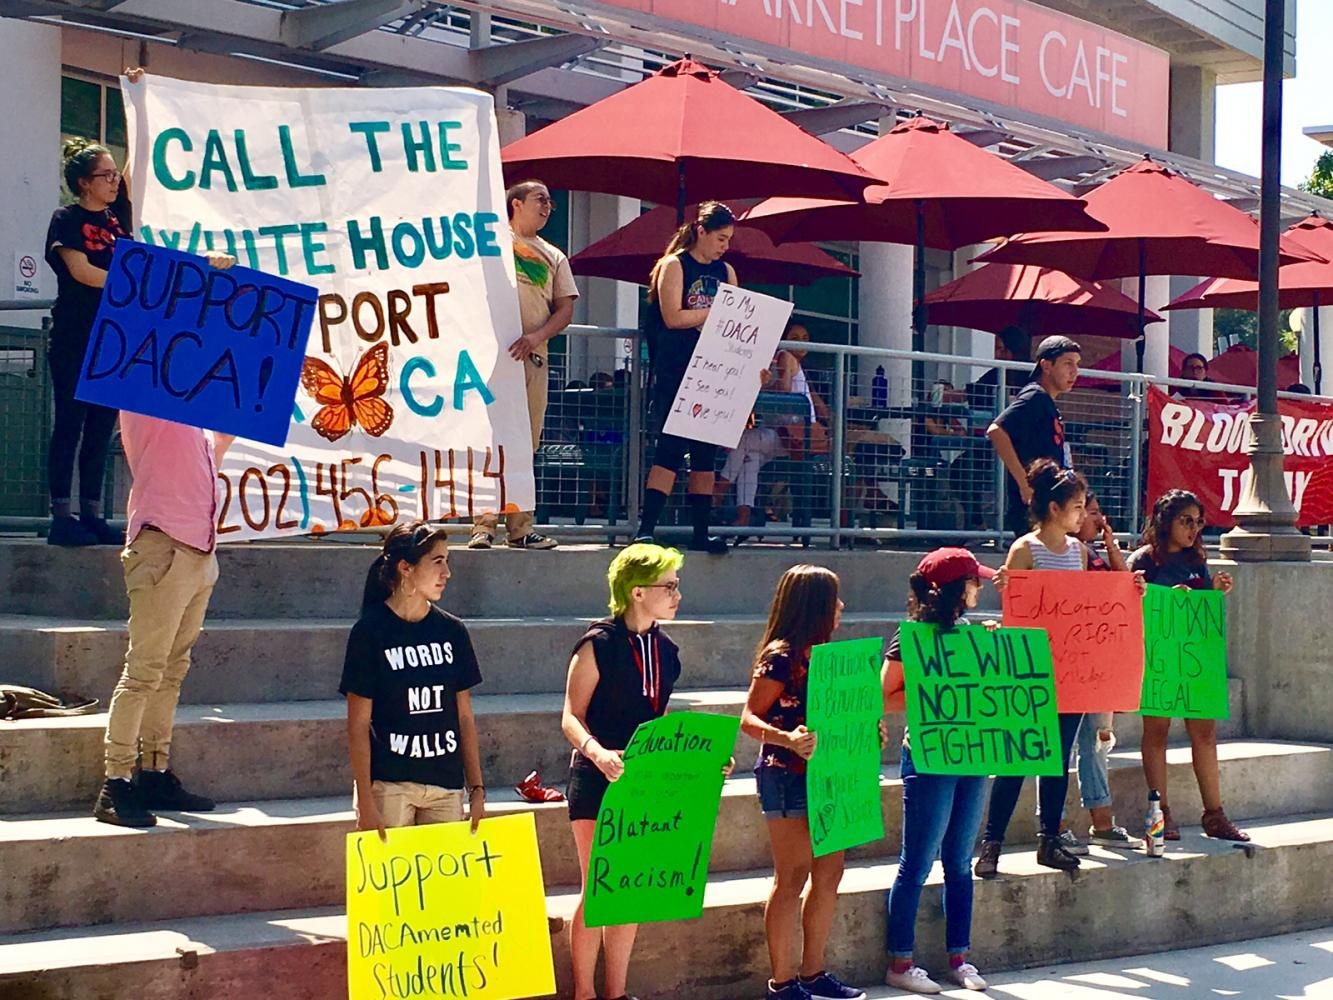 Chico+students+protest+the+DACA+decision.+Photo+credit%3A+Luke+Dennison